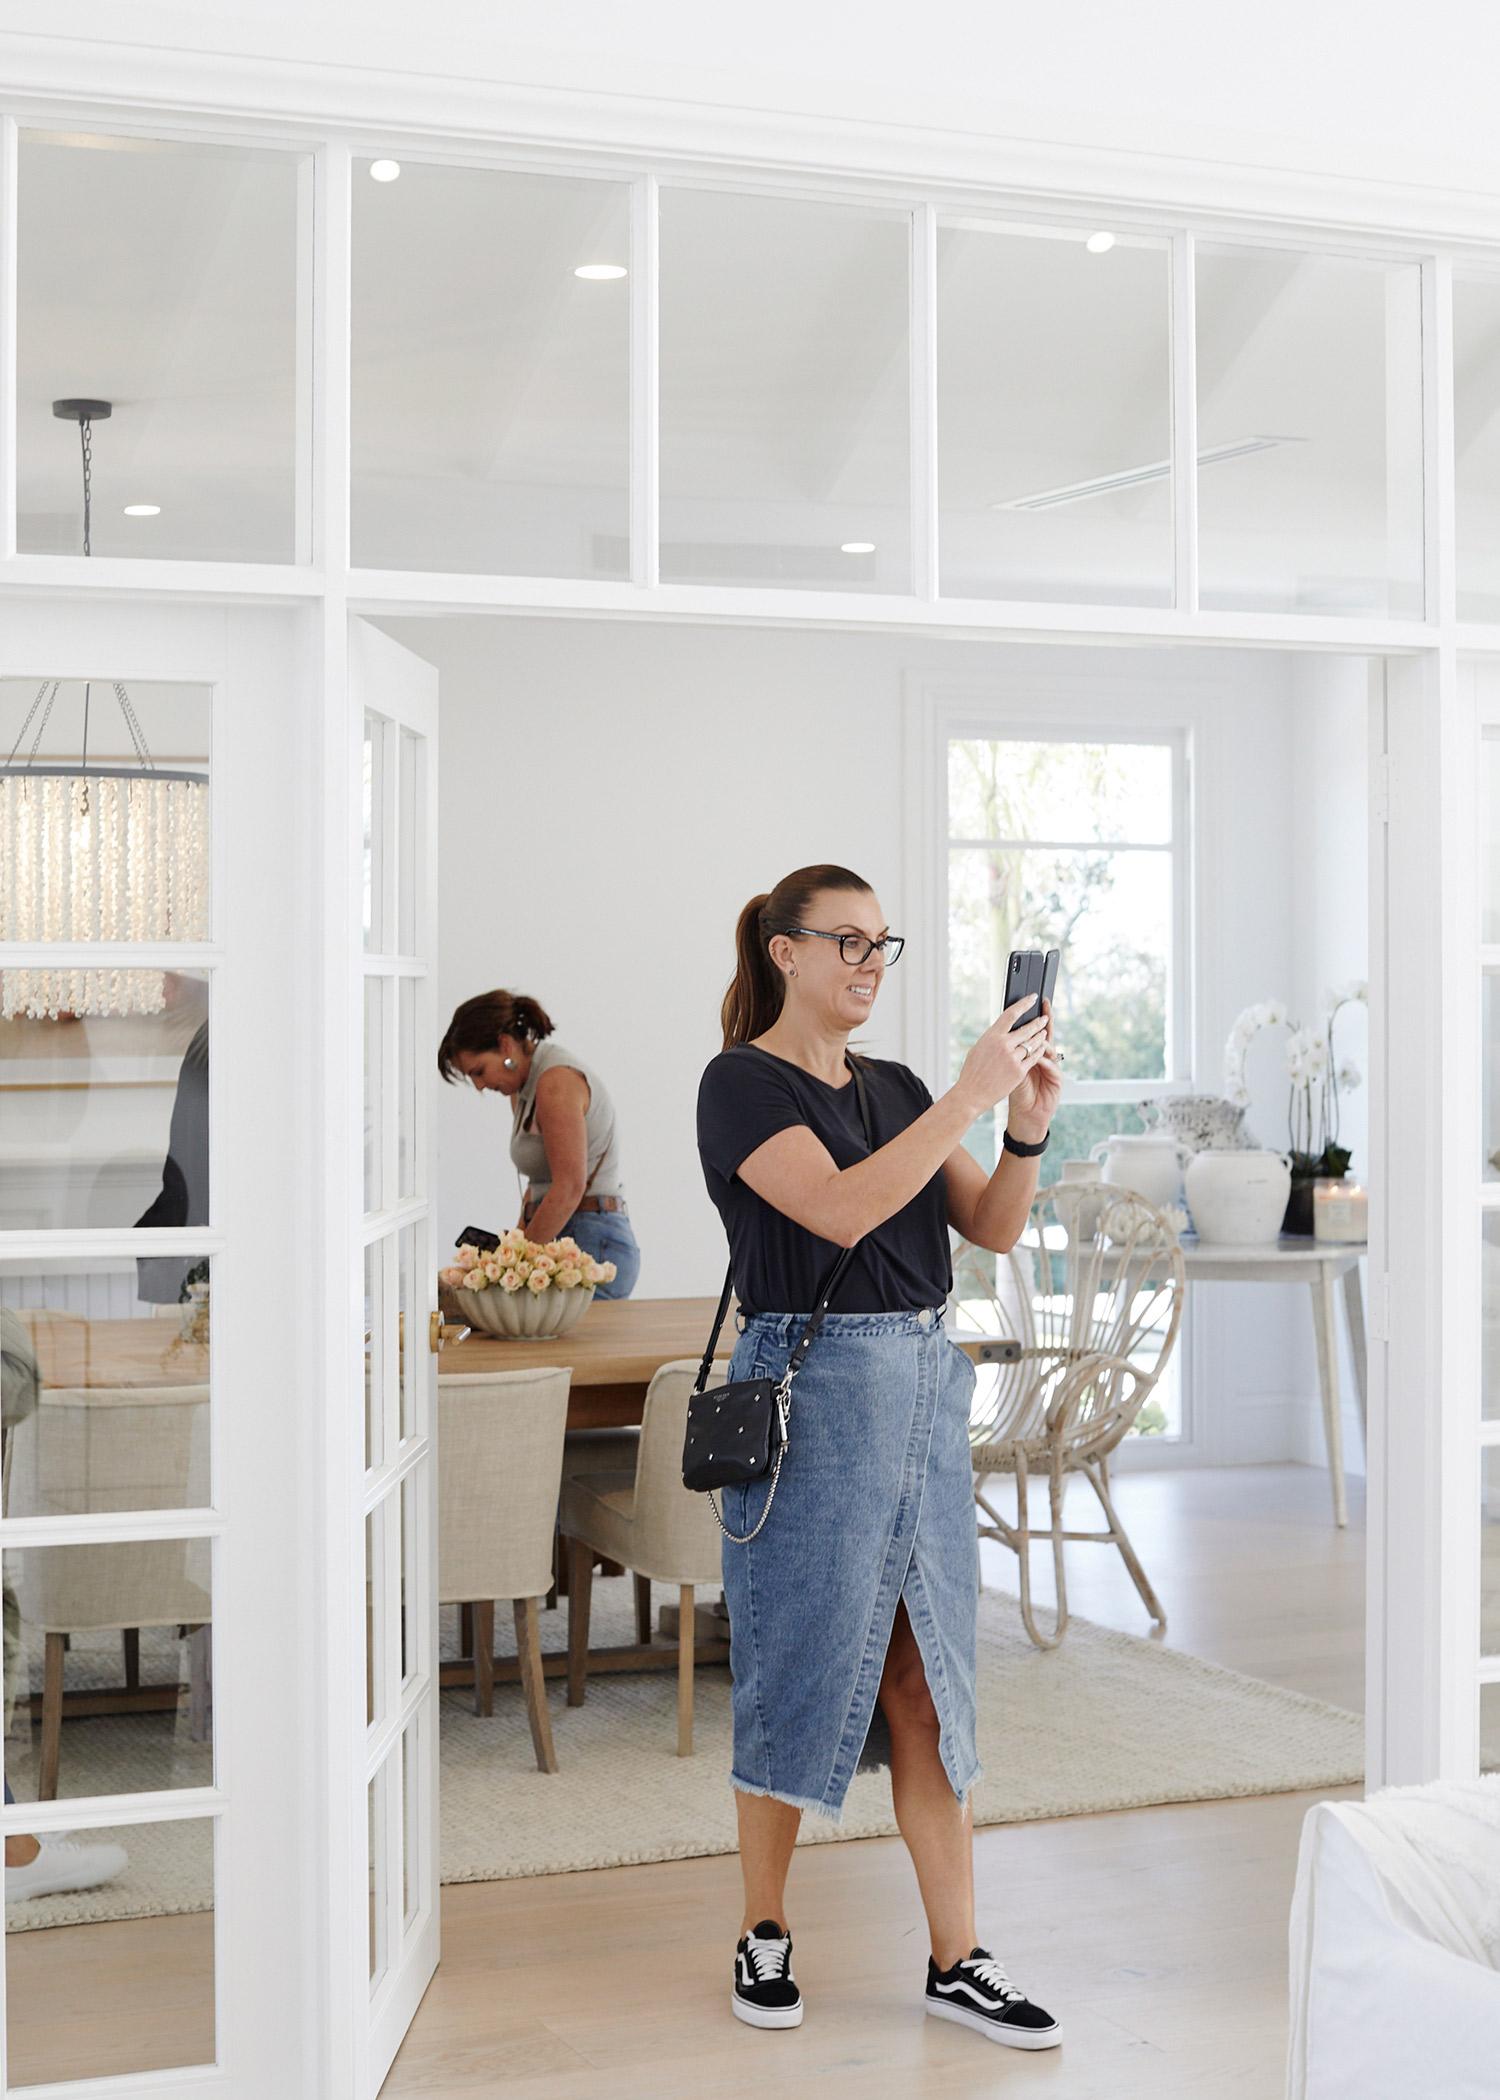 180727_HouseEight_OpenHouse_270.jpg